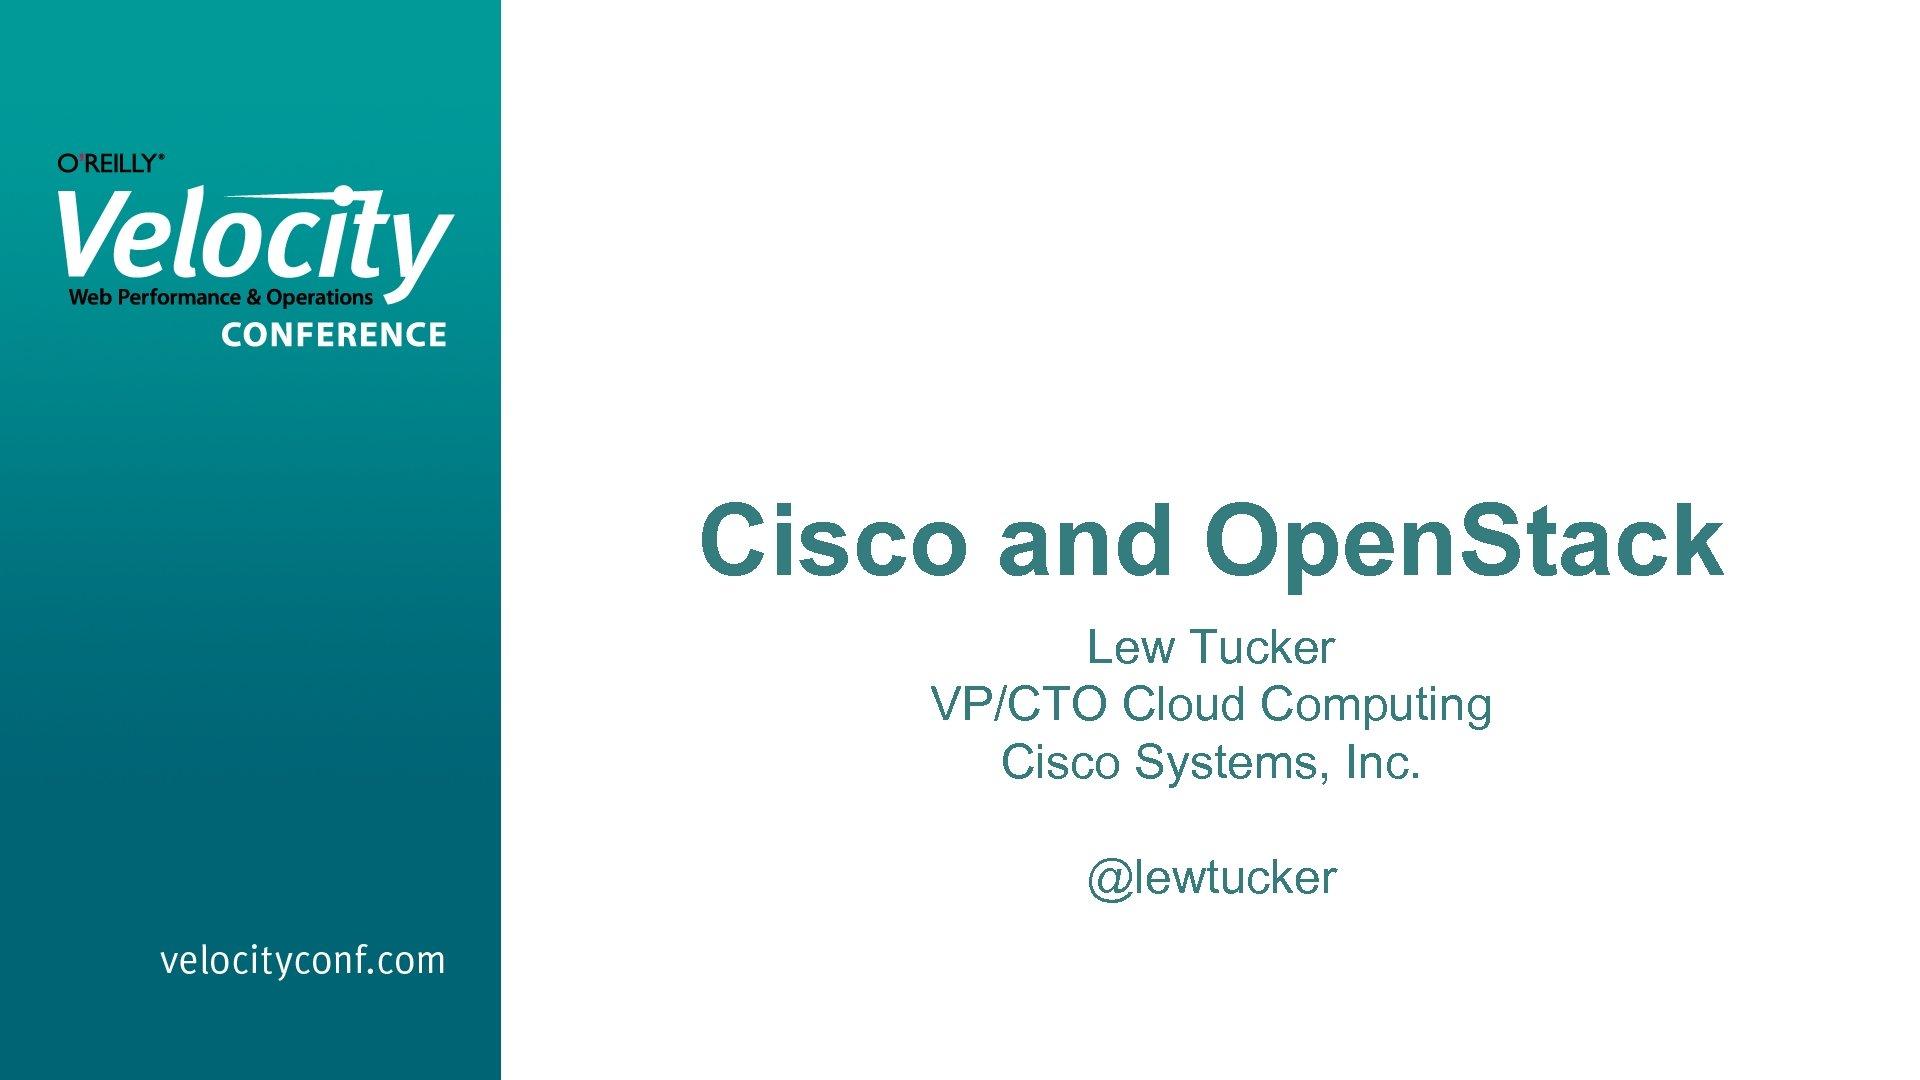 Cisco and Open. Stack Lew Tucker VP/CTO Cloud Computing Cisco Systems, Inc. @lewtucker